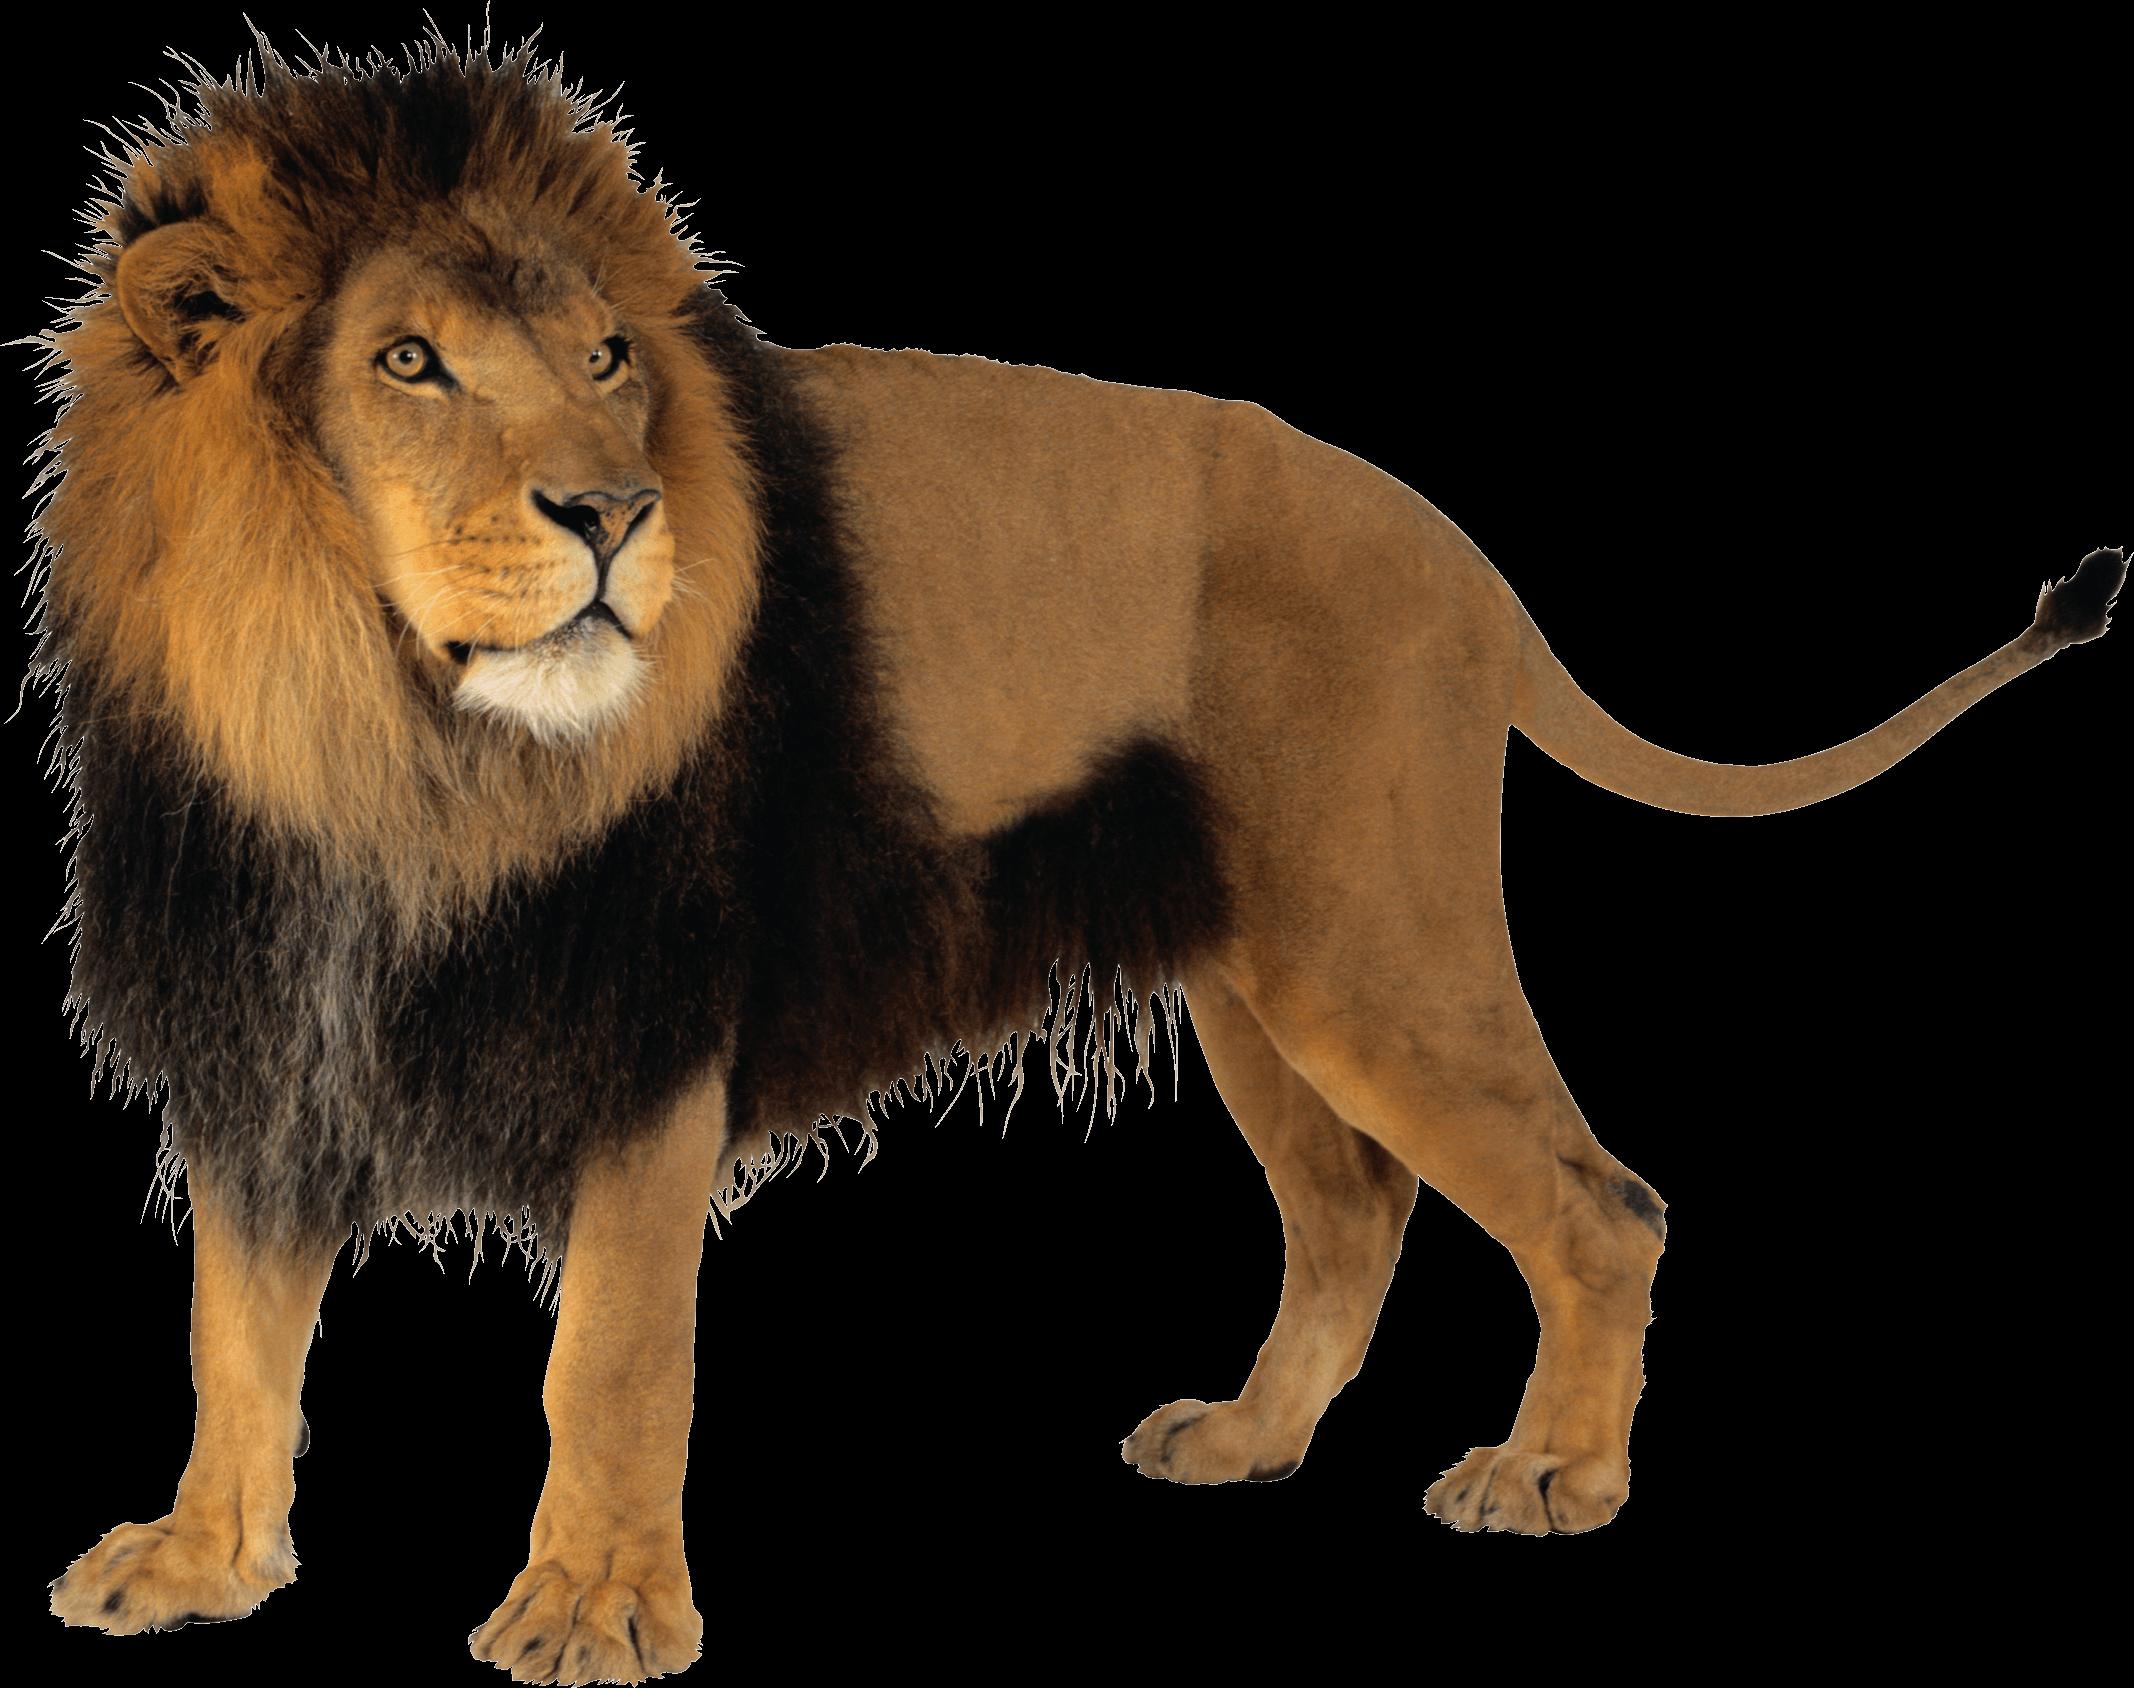 Lion Png Images Download: Download Lion Png Image HQ PNG Image